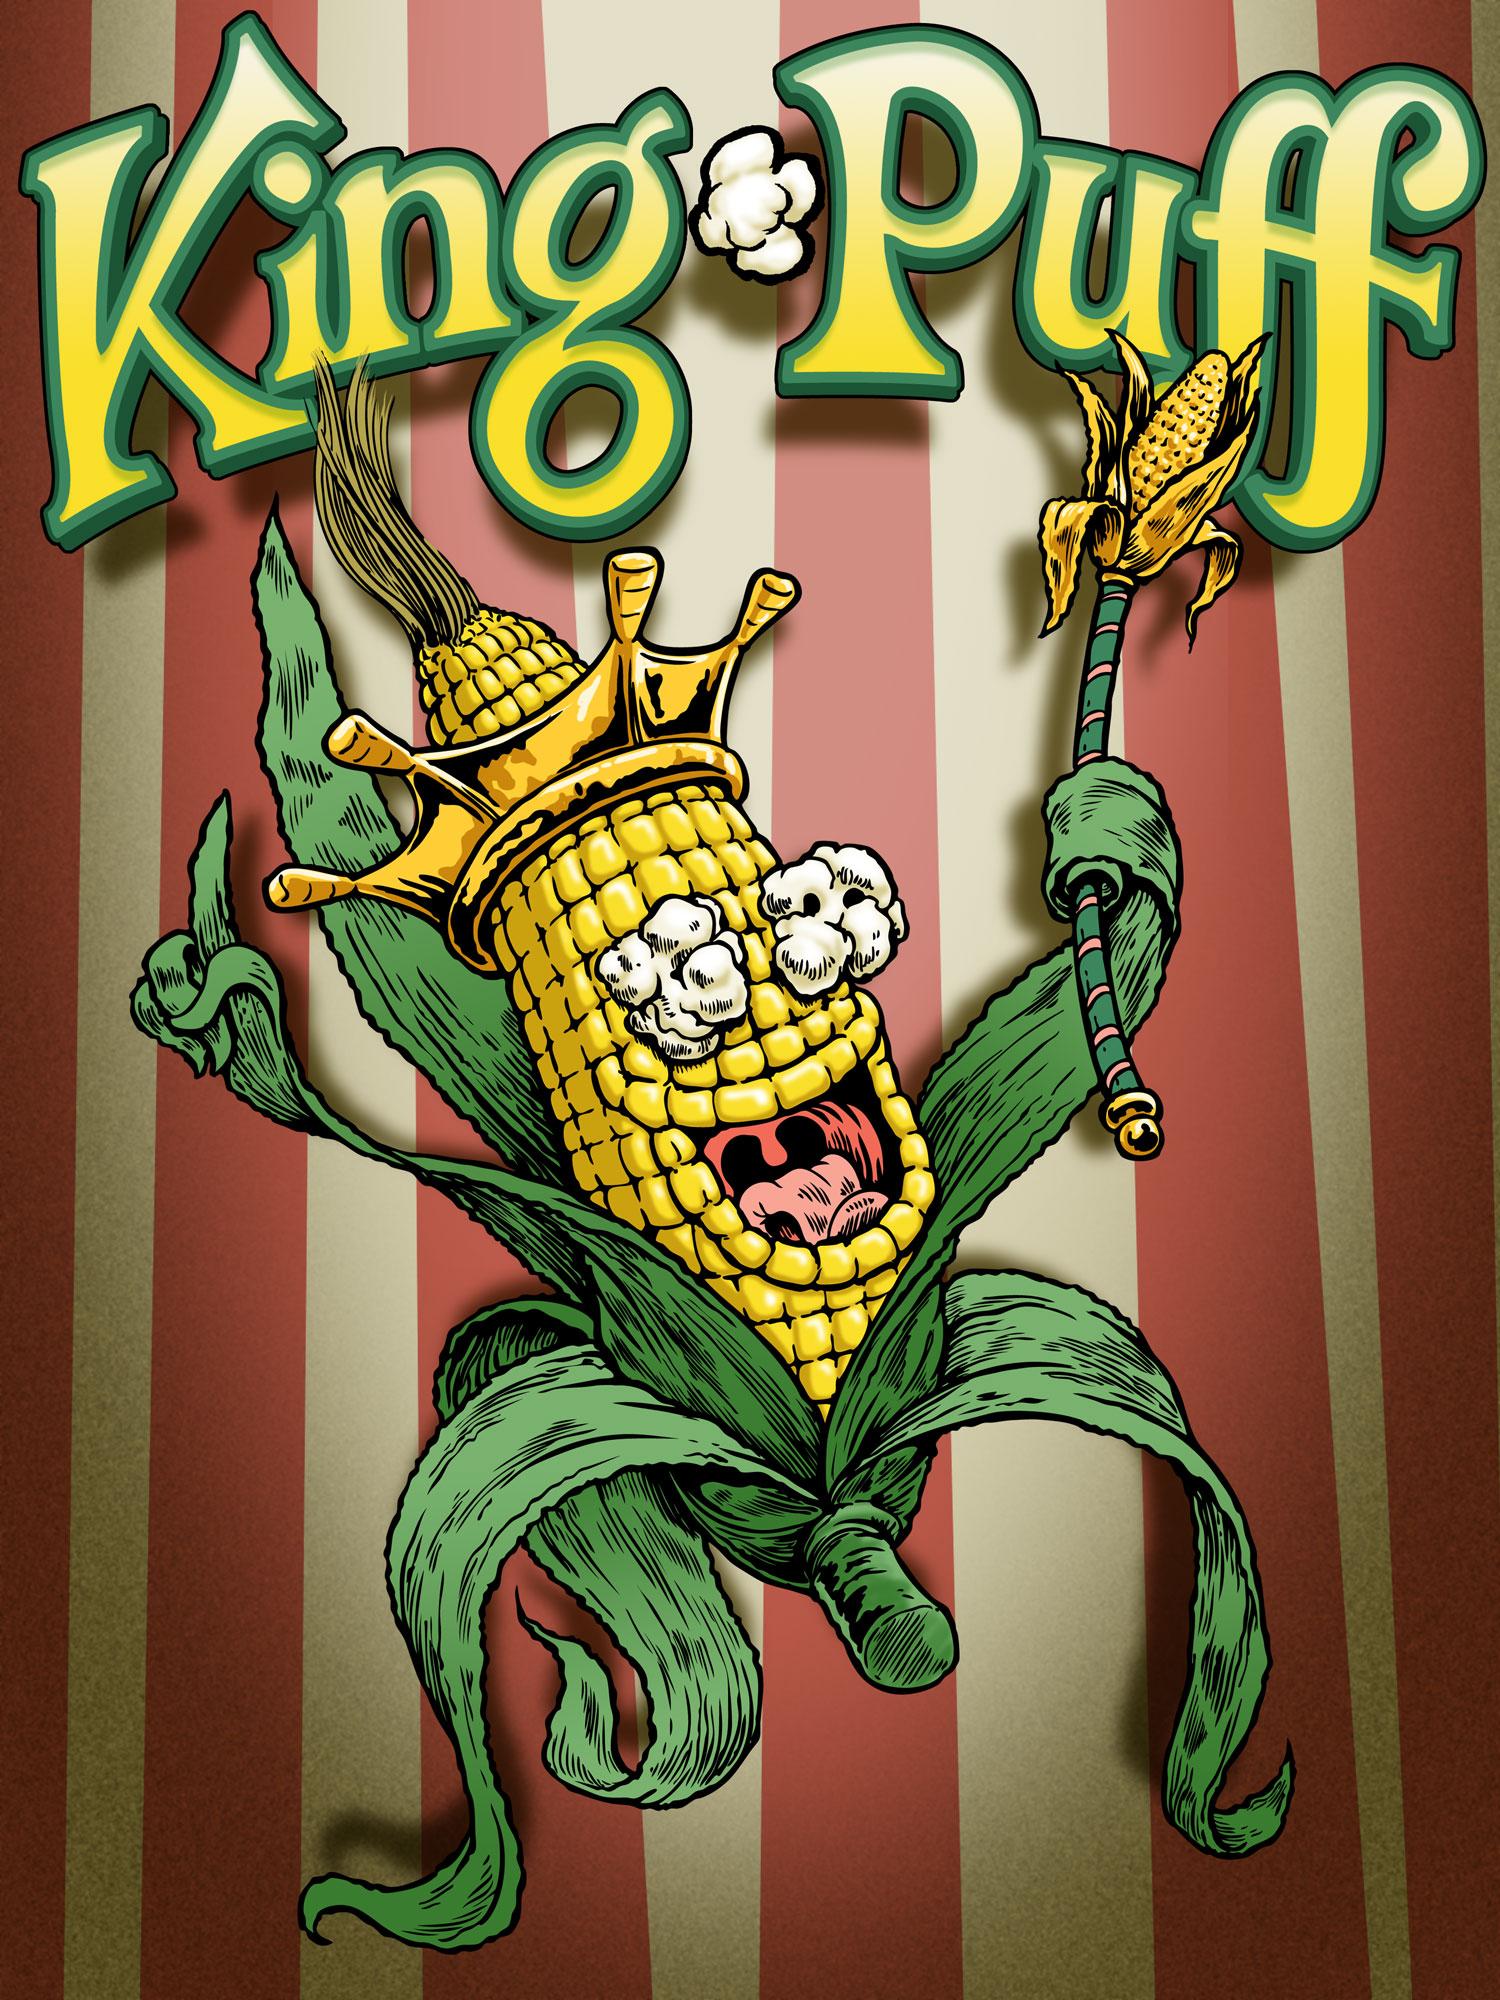 King-Puff-Layout.jpg